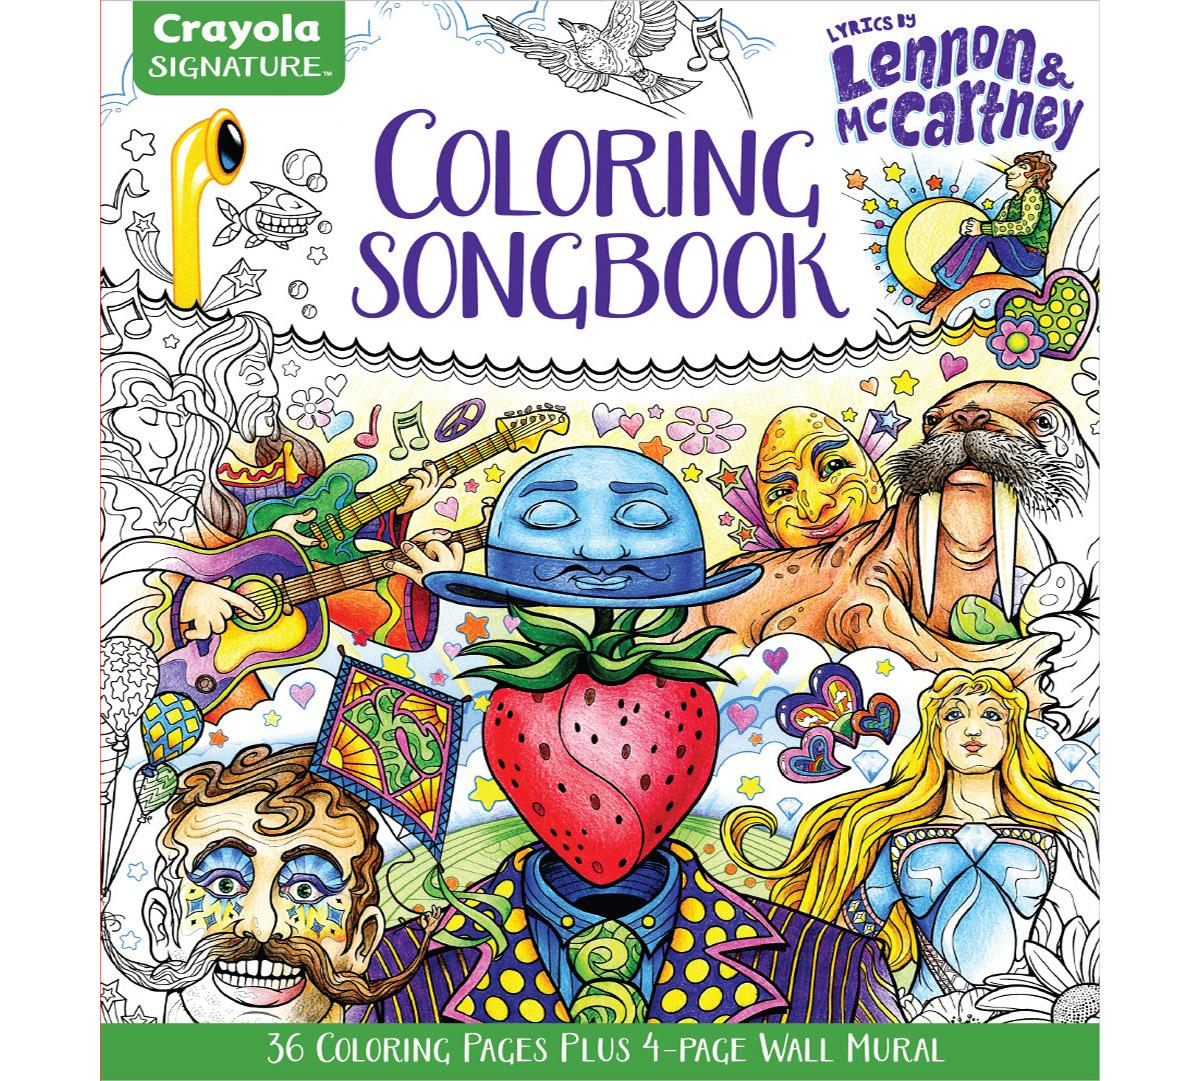 Lennon And Mccartney Lyrics Coloring Book Crayola Com Crayola